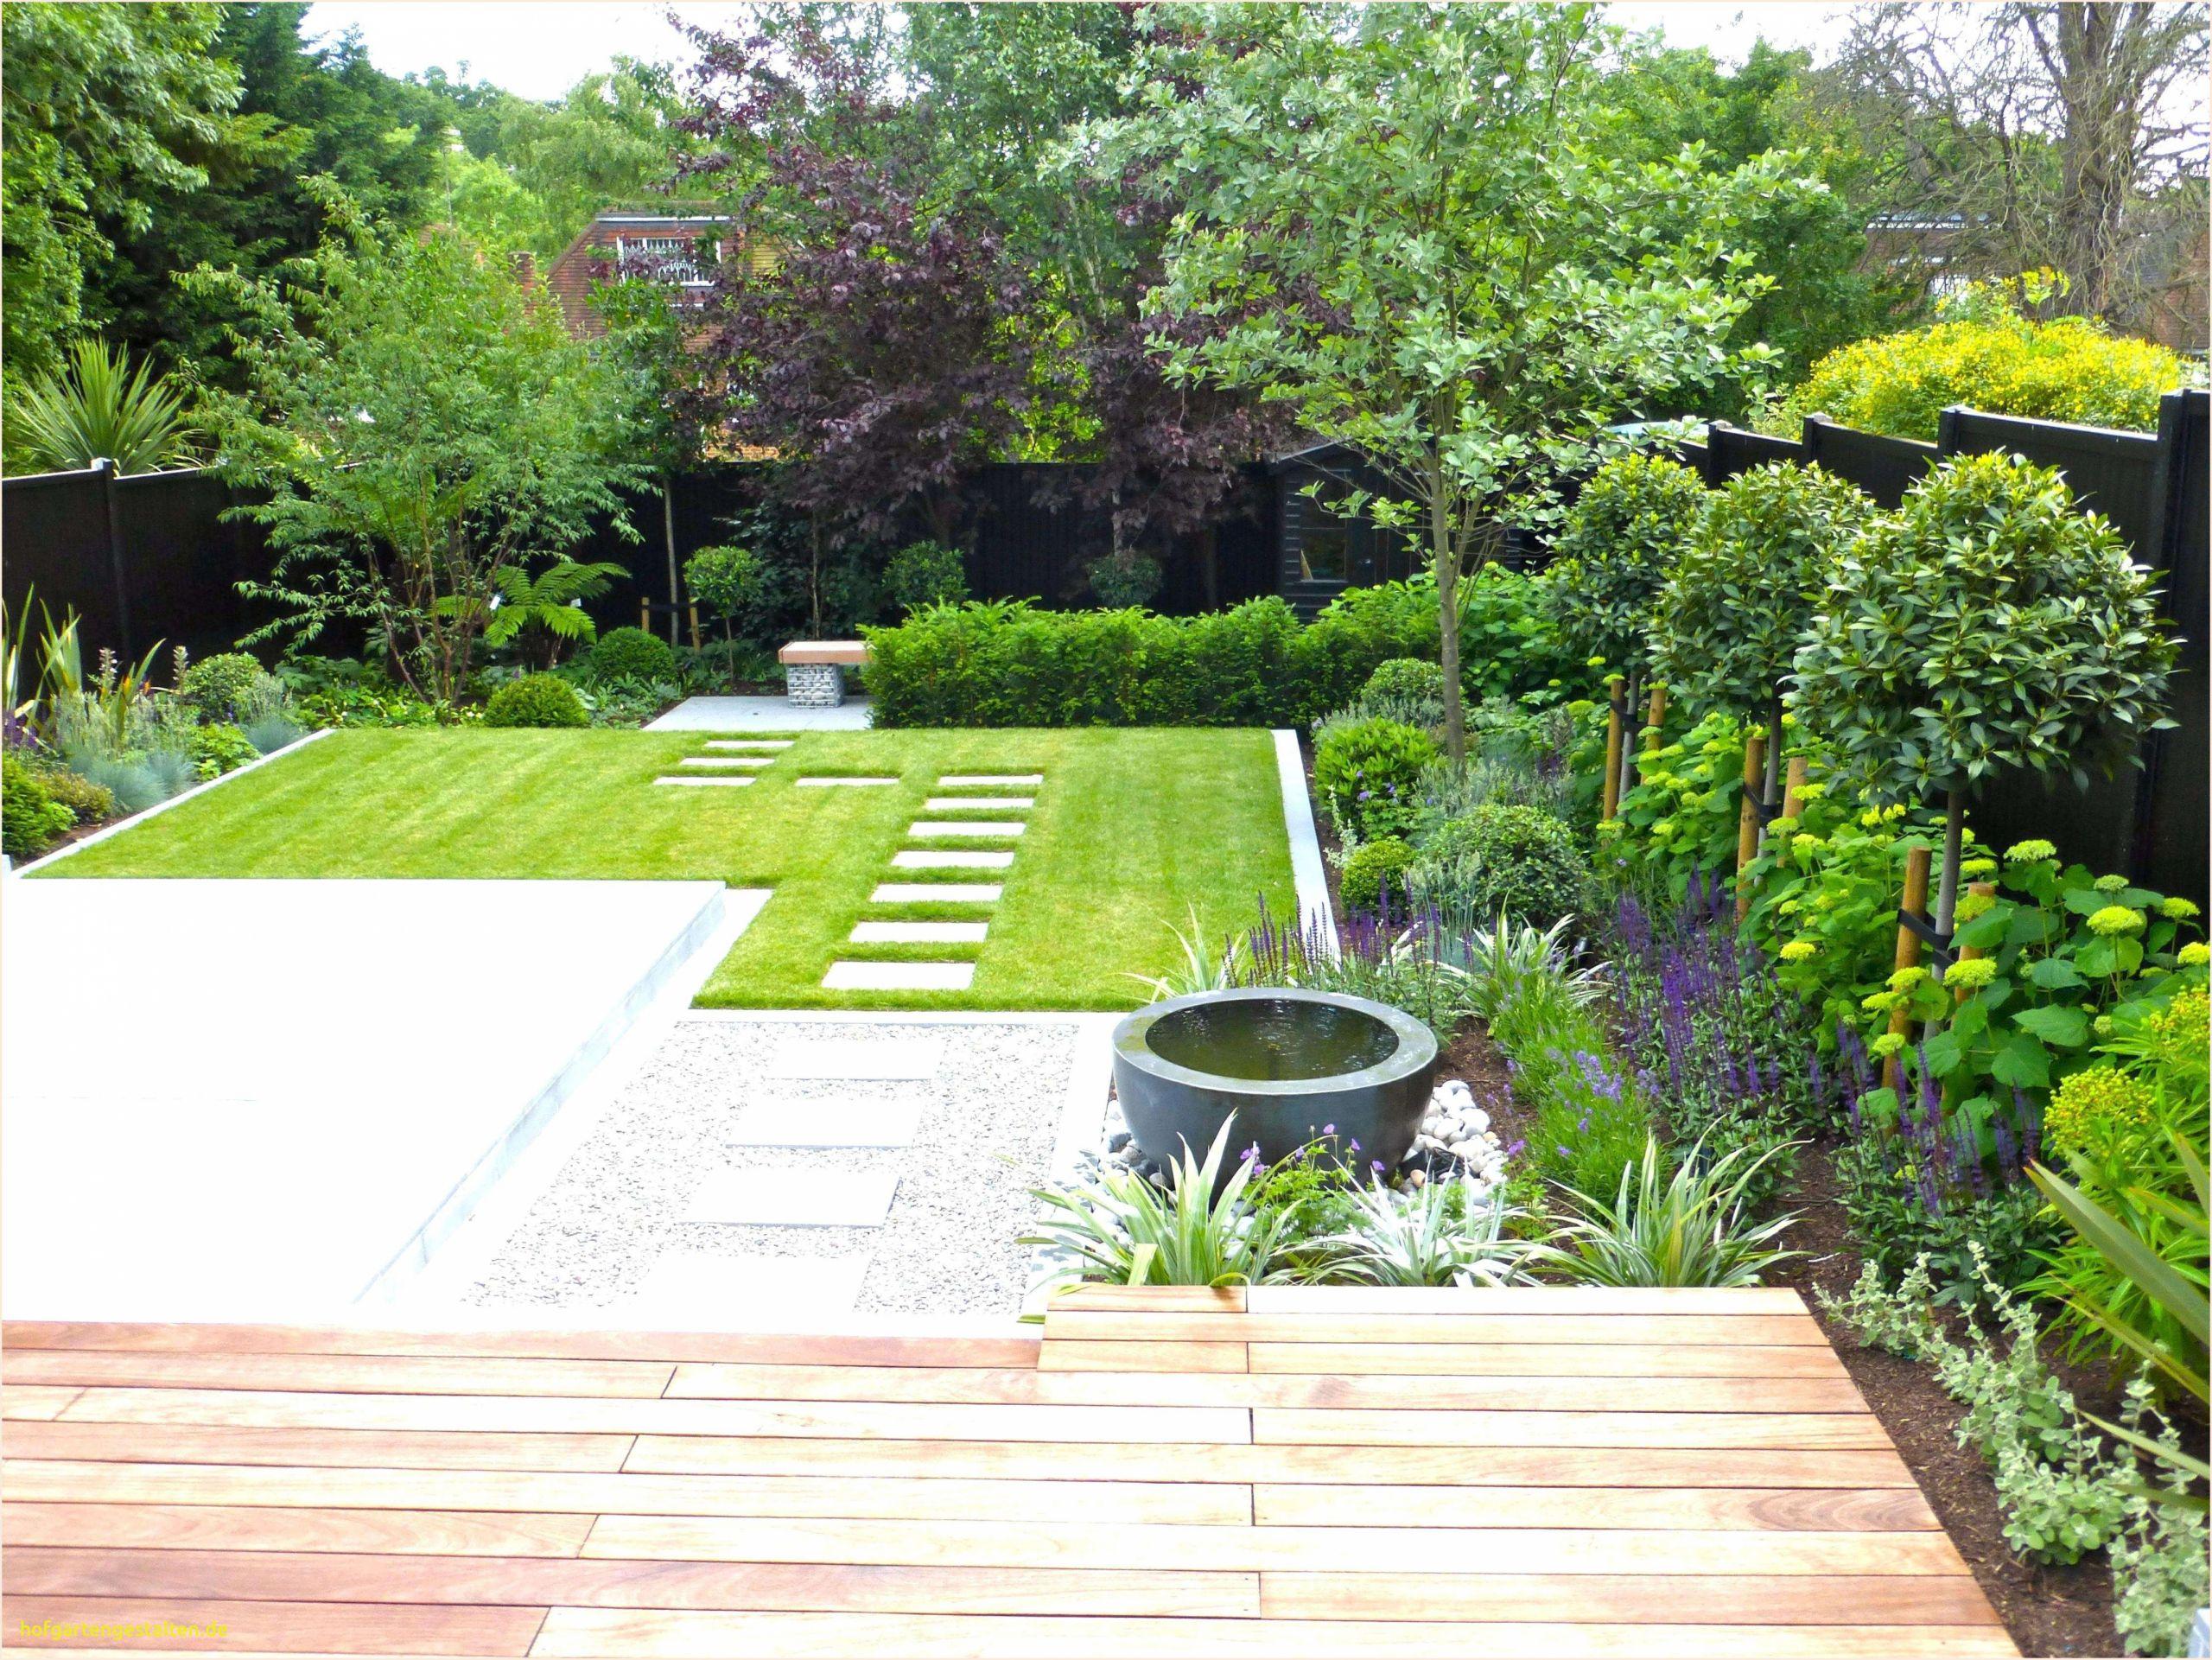 12 Einzigartig Garten Ideen Selber Machen  Garten Deko Dekor